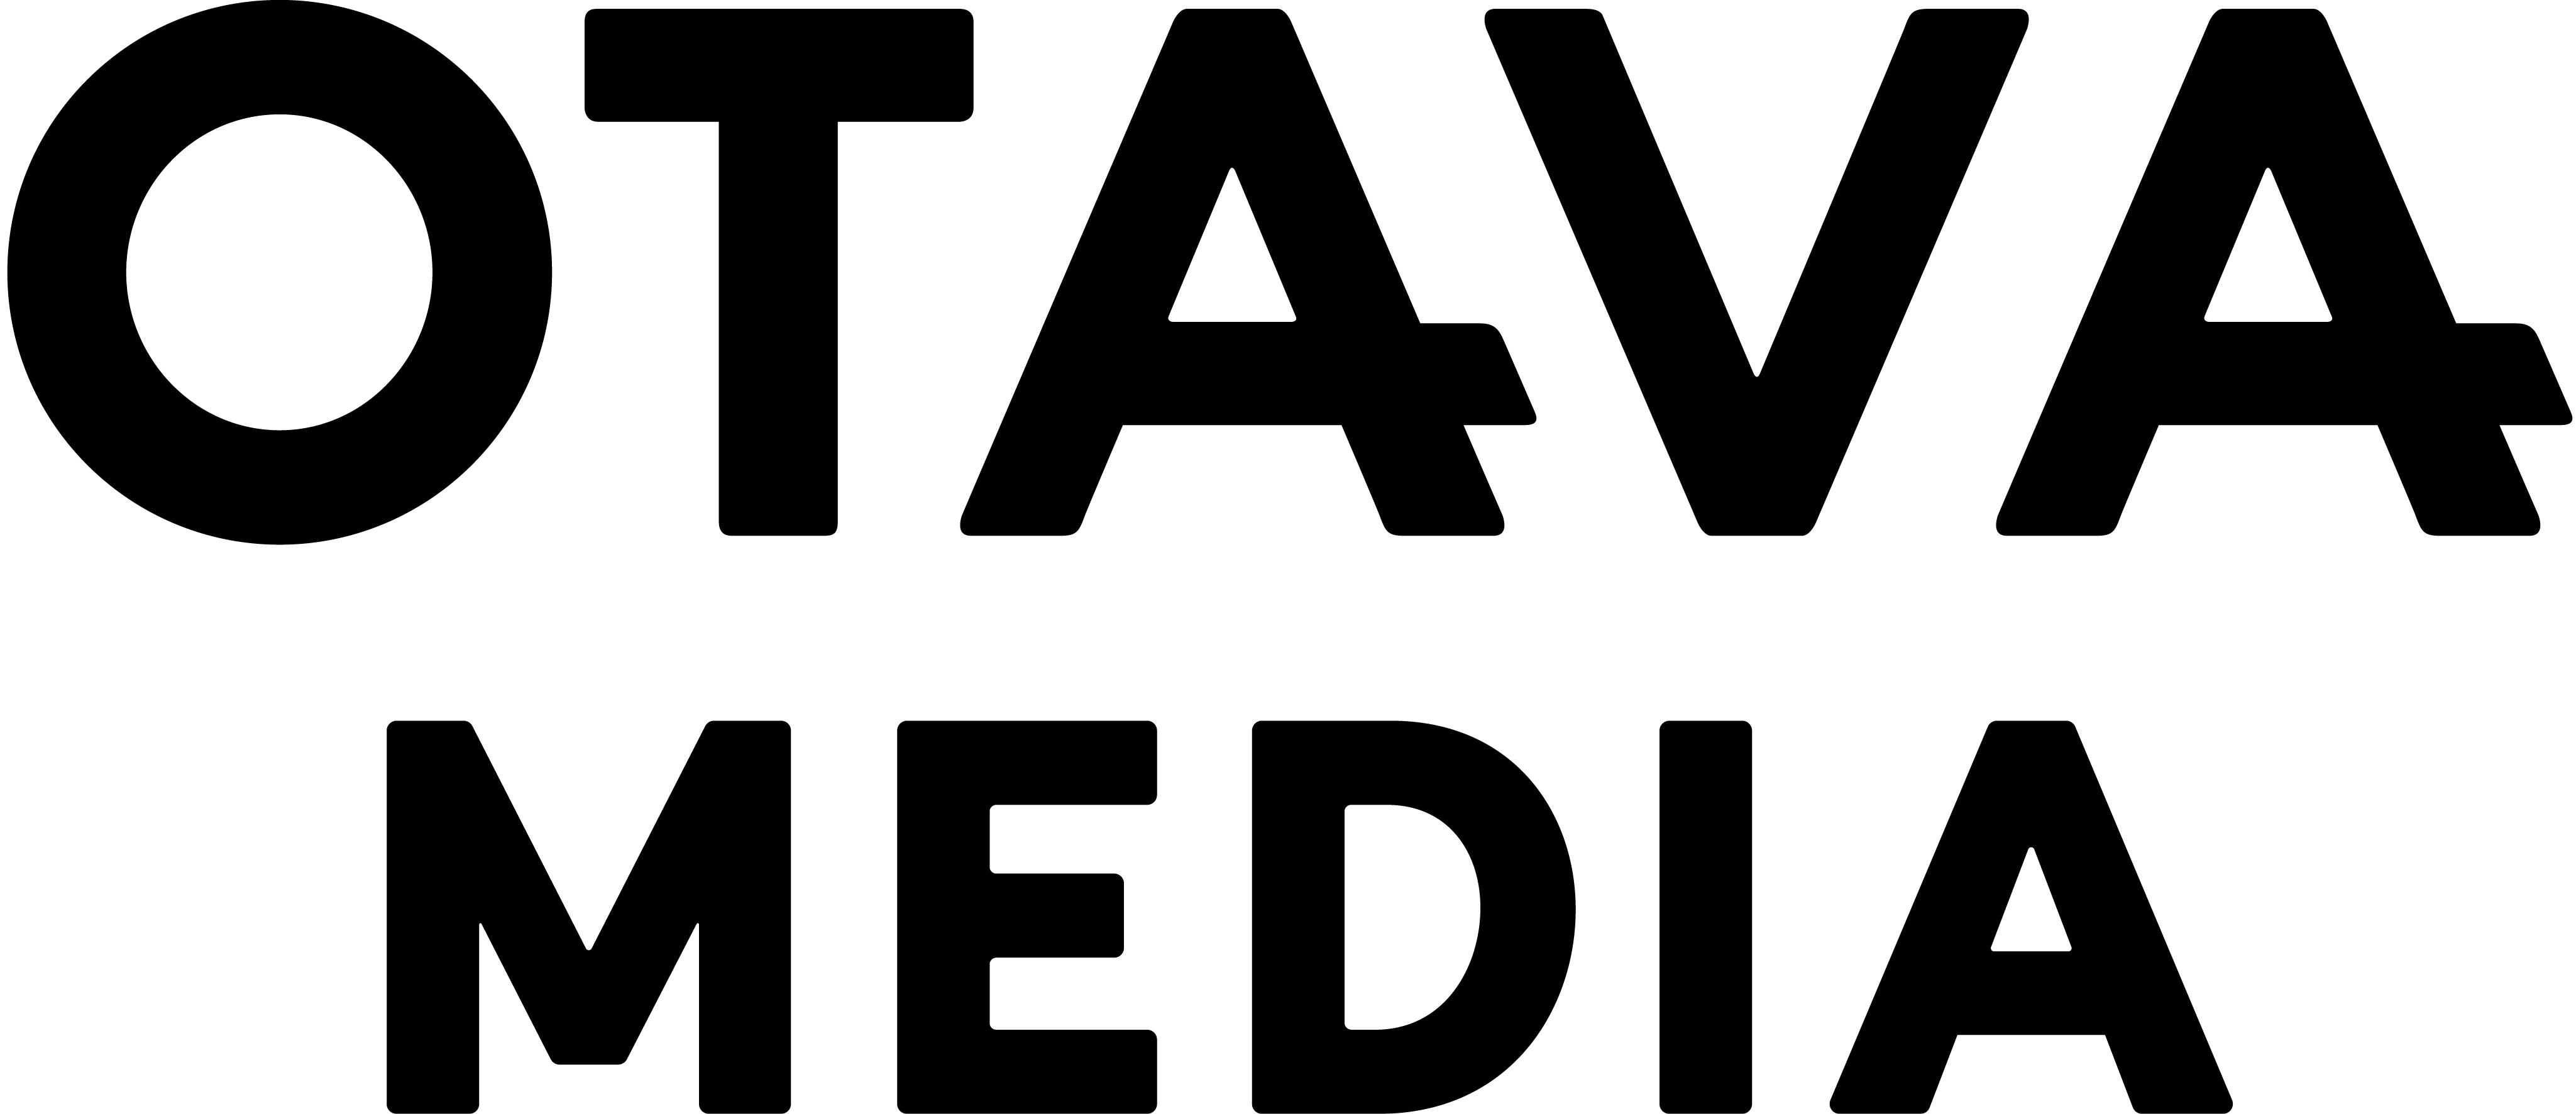 otavamedia_logo.jpg (252 KB)